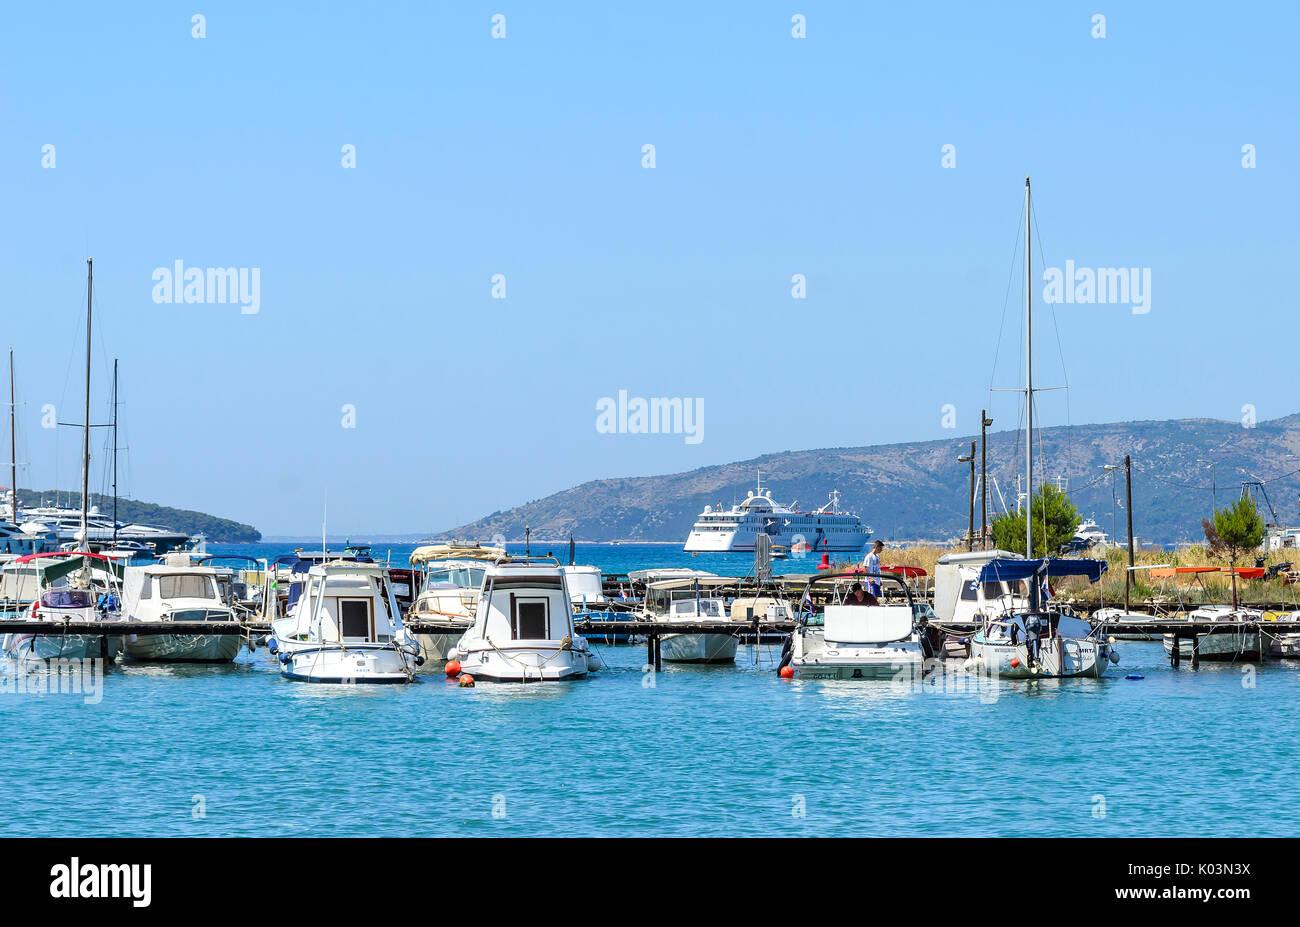 Sea port city of Trogir, Croatia. - Stock Image